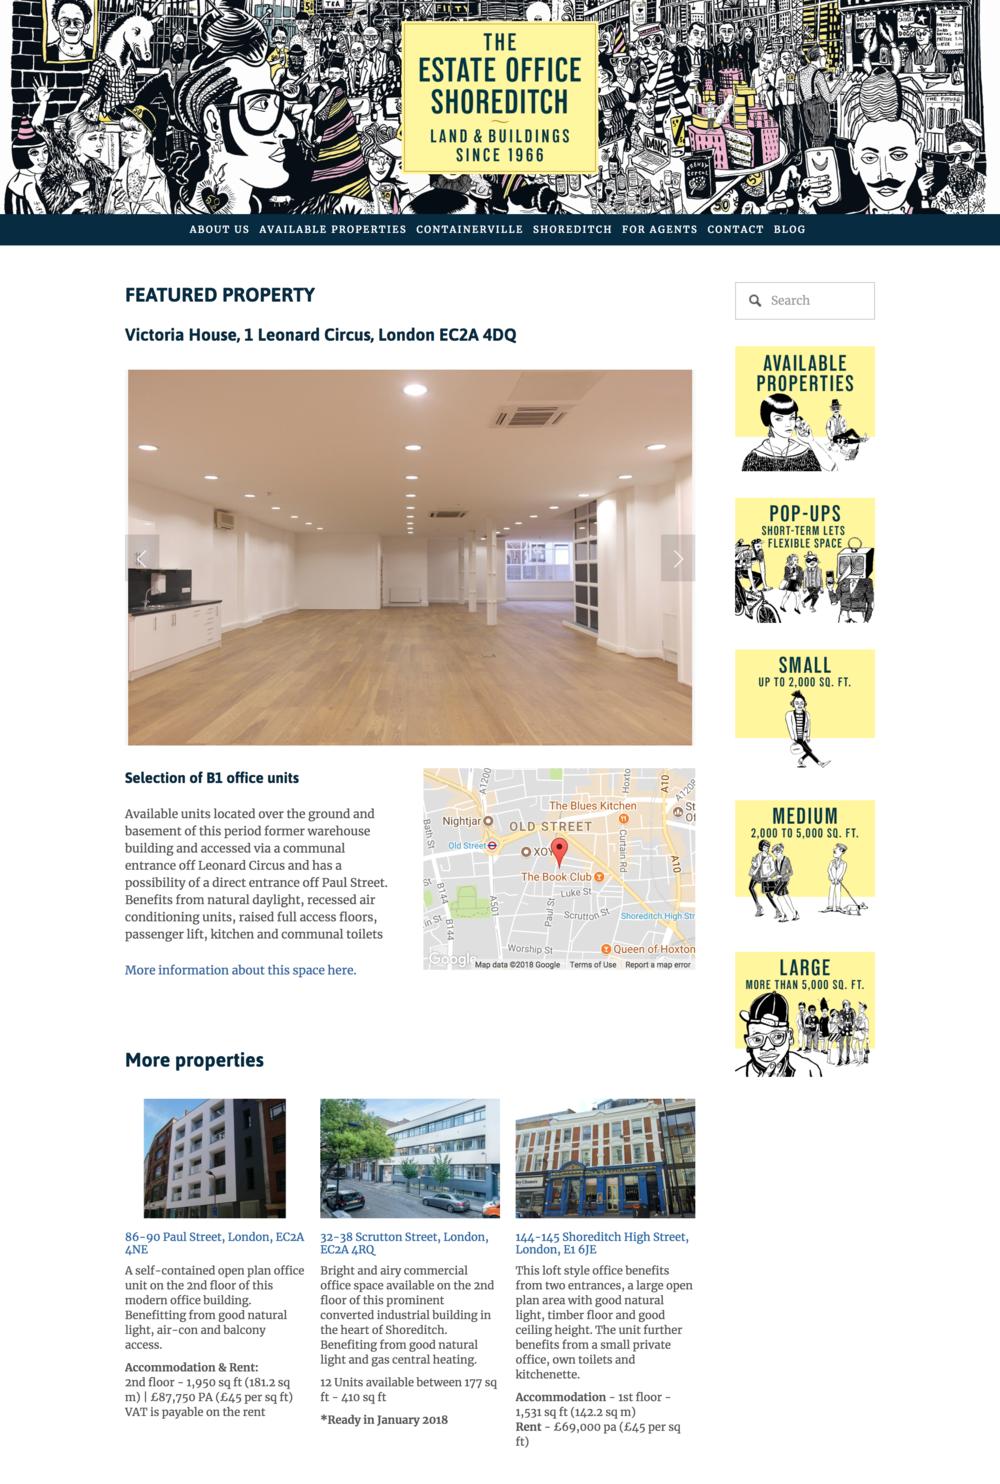 The Estate Office Shoreditch Real Estate Website